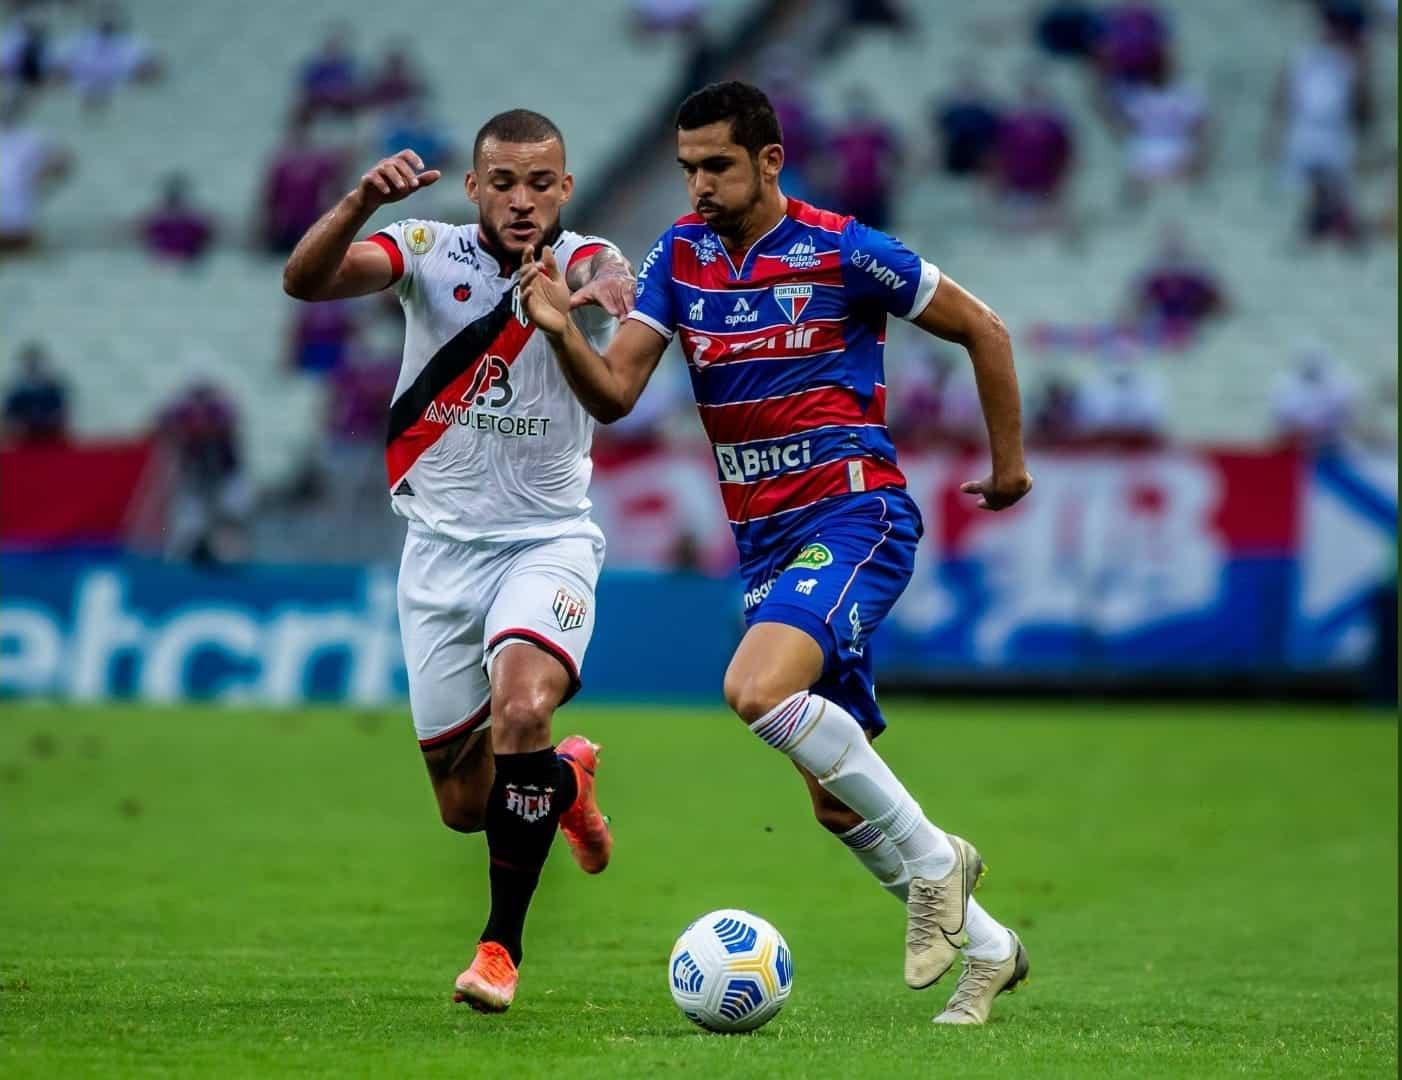 Fortaleza x Atlético-GO